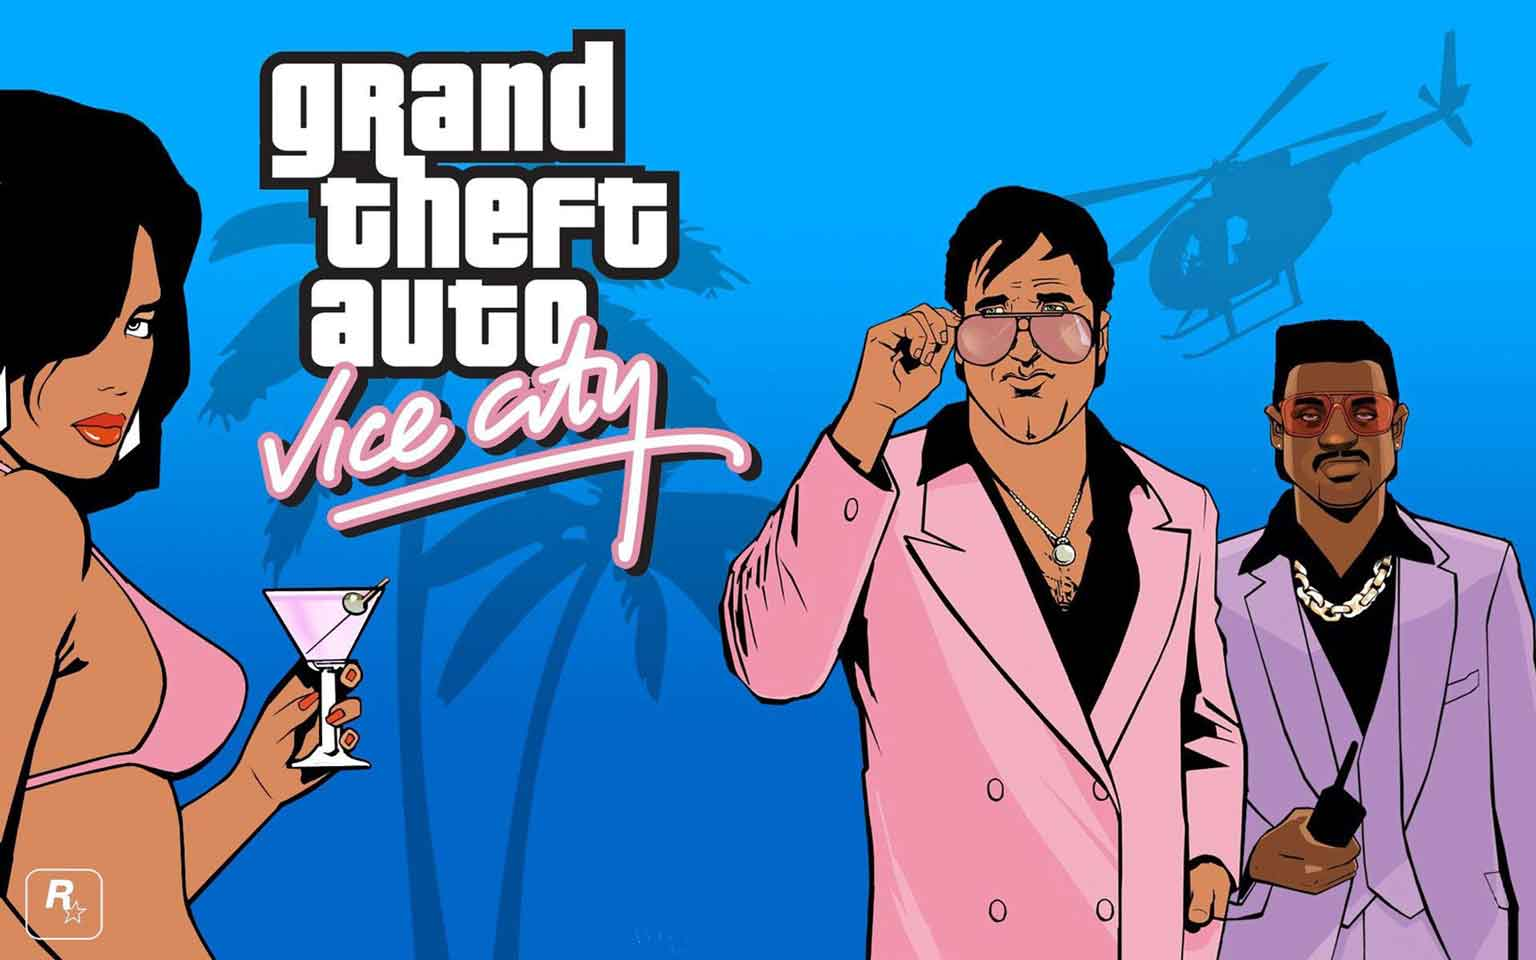 Grand-Theft-Auto-Vice-City-1